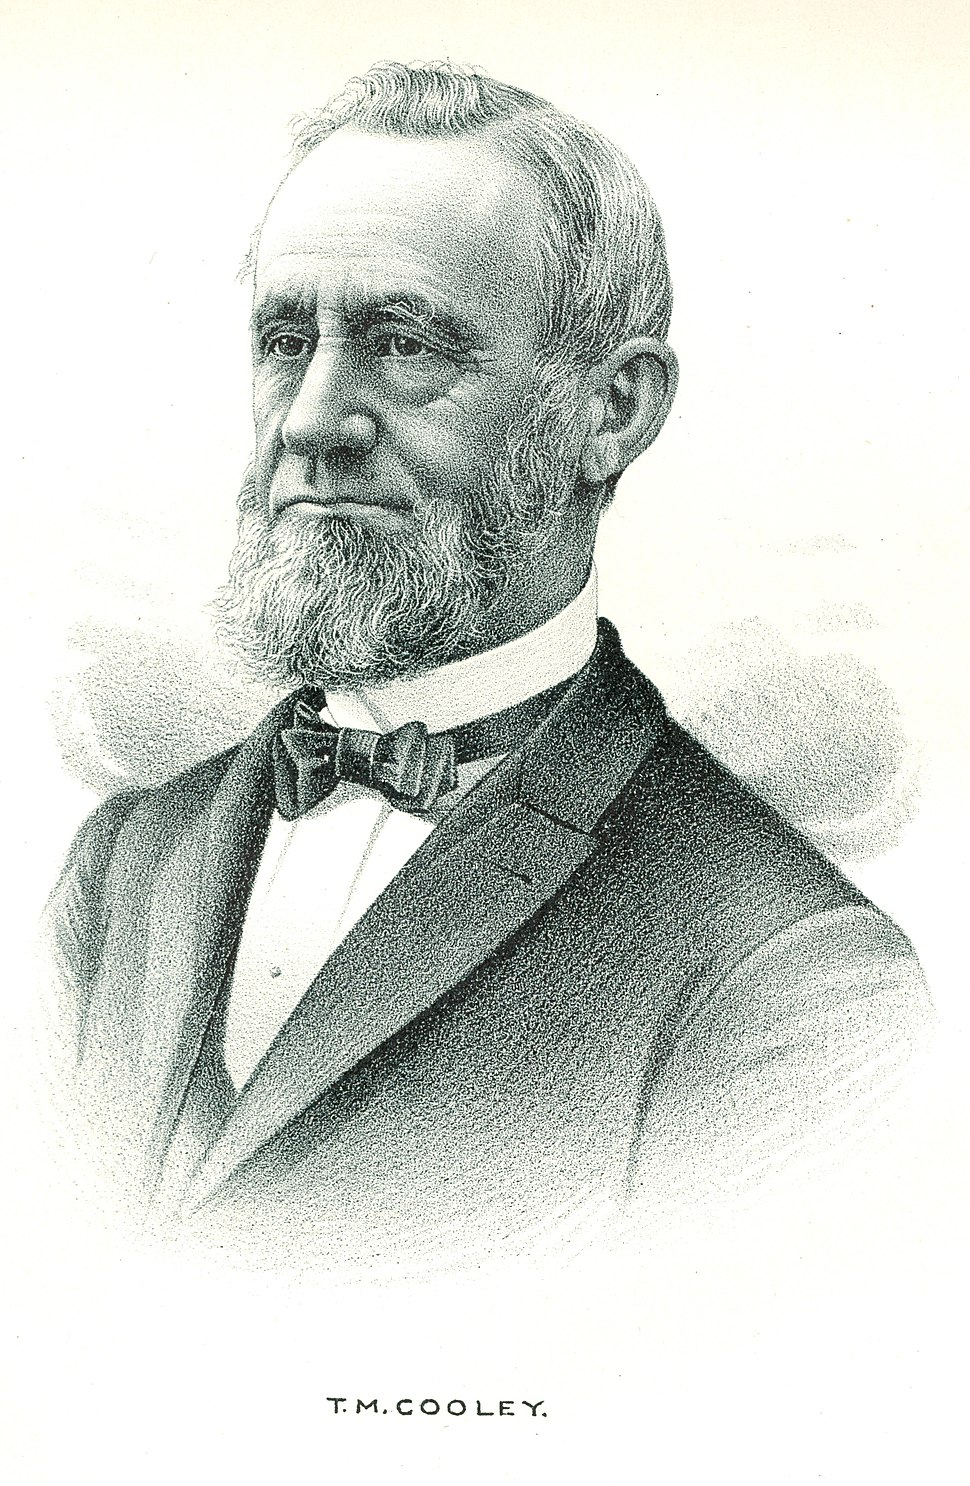 Thomas M Cooley